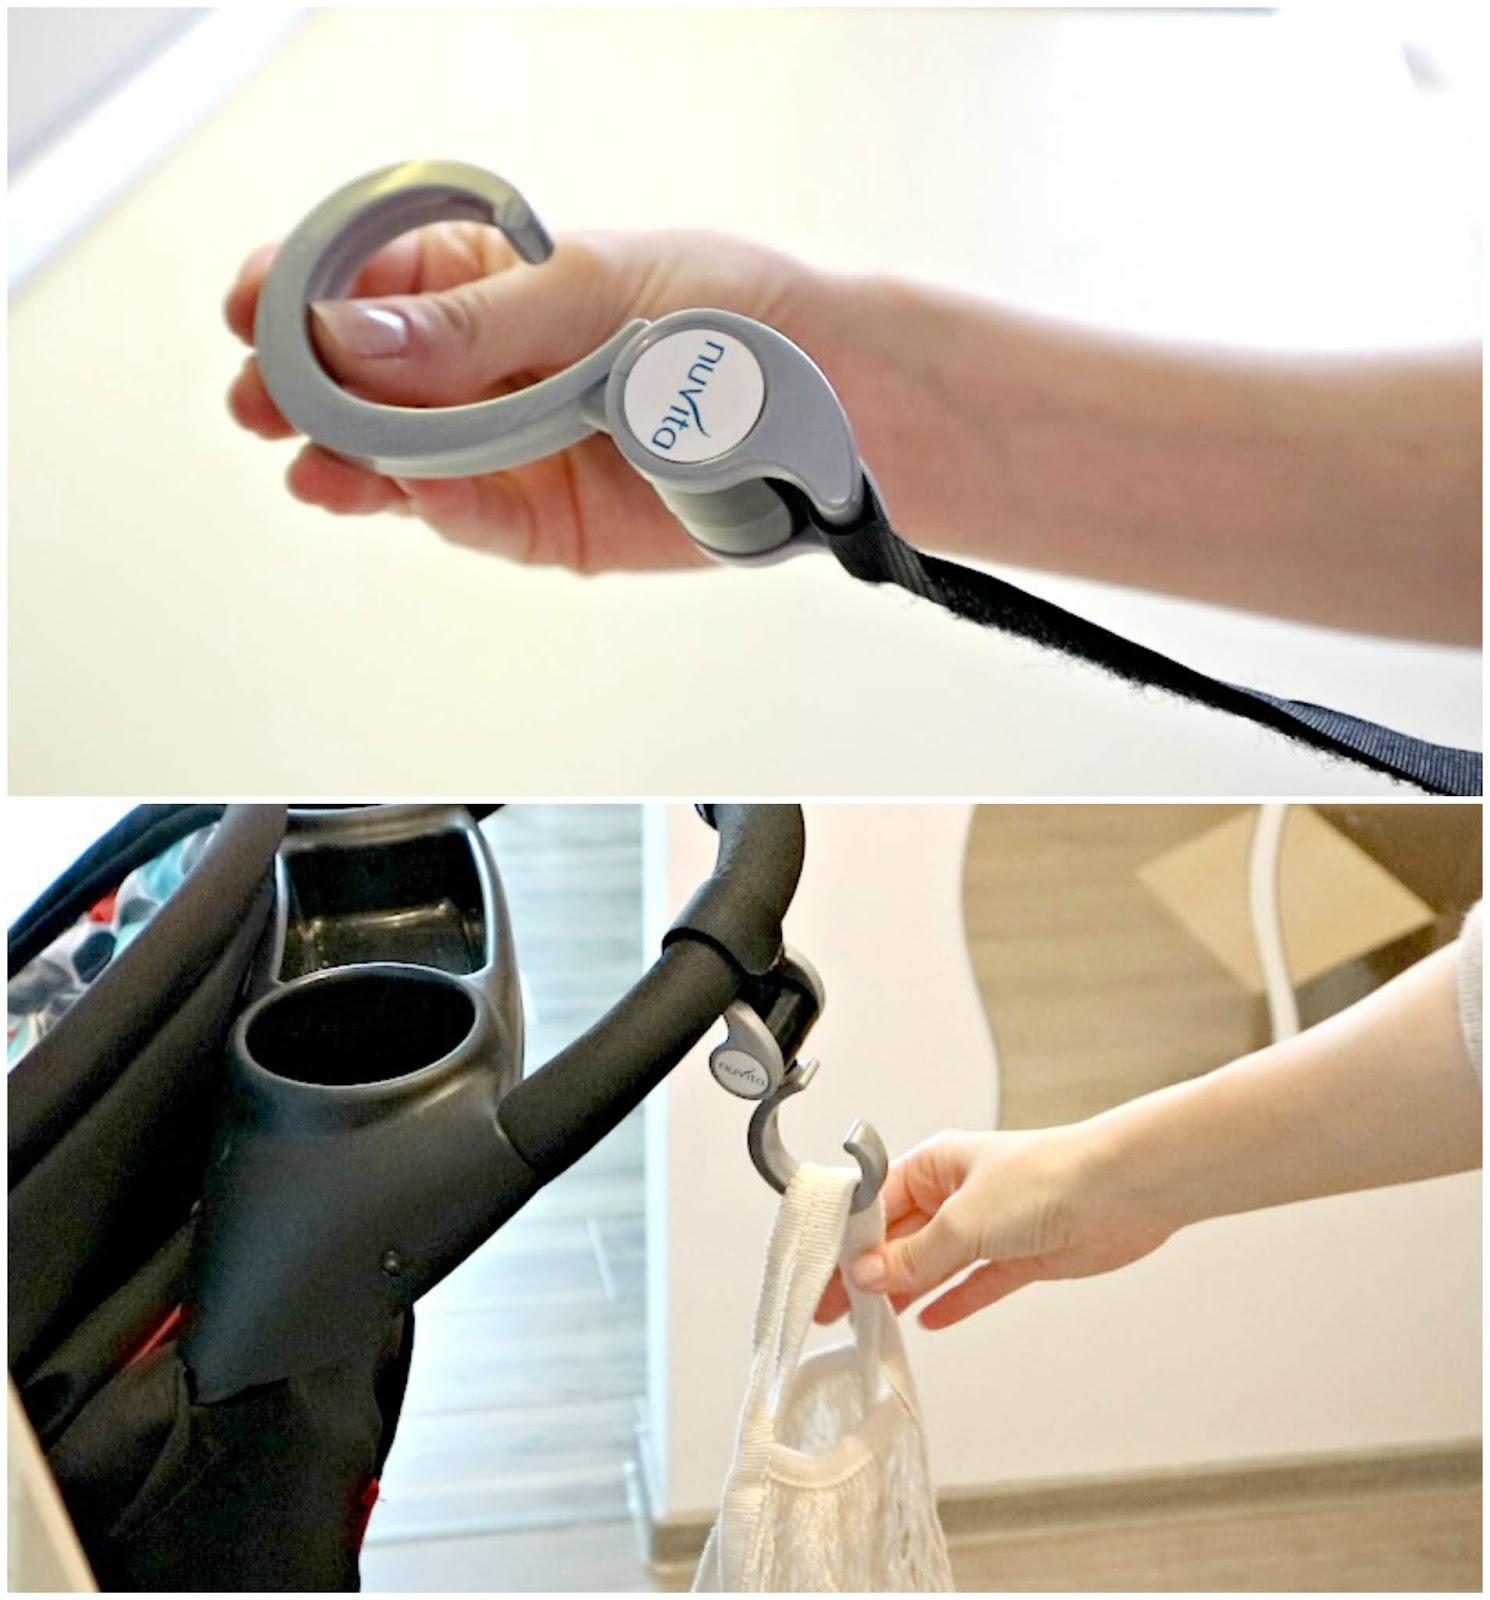 stroller hook for grocery bags new mom hacks